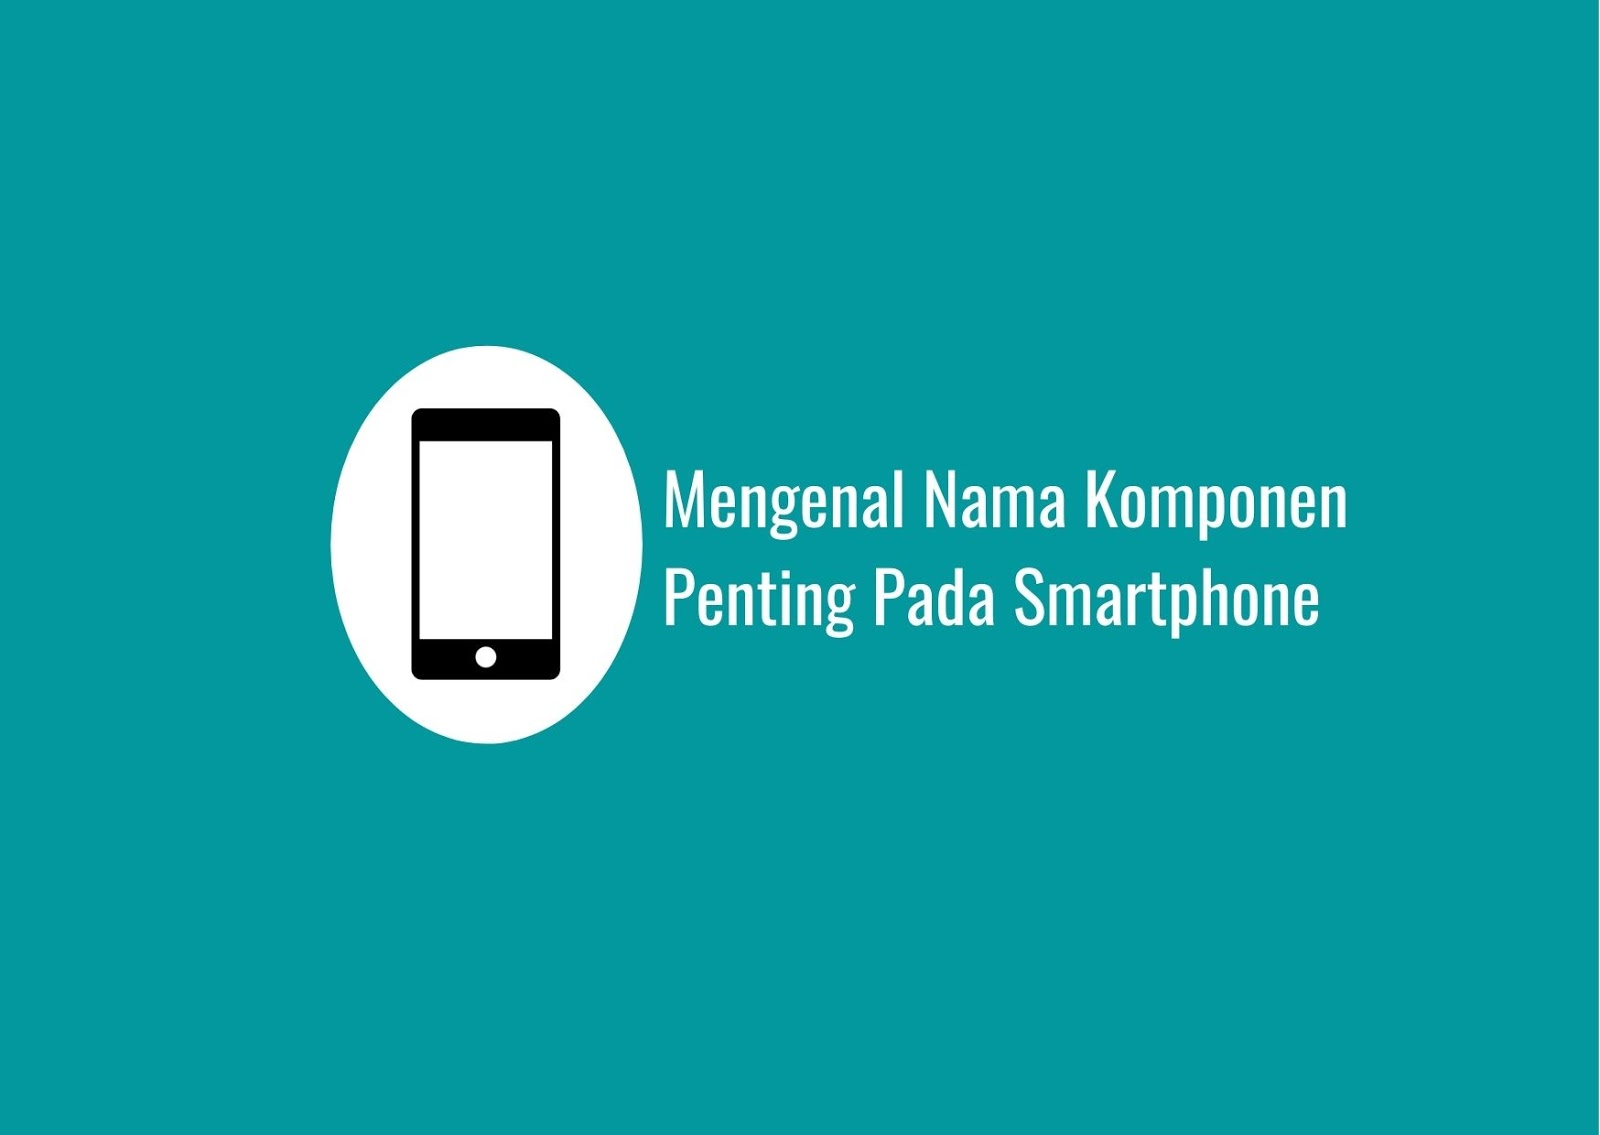 Mengenal Nama Komponen Penting Pada Smartphone